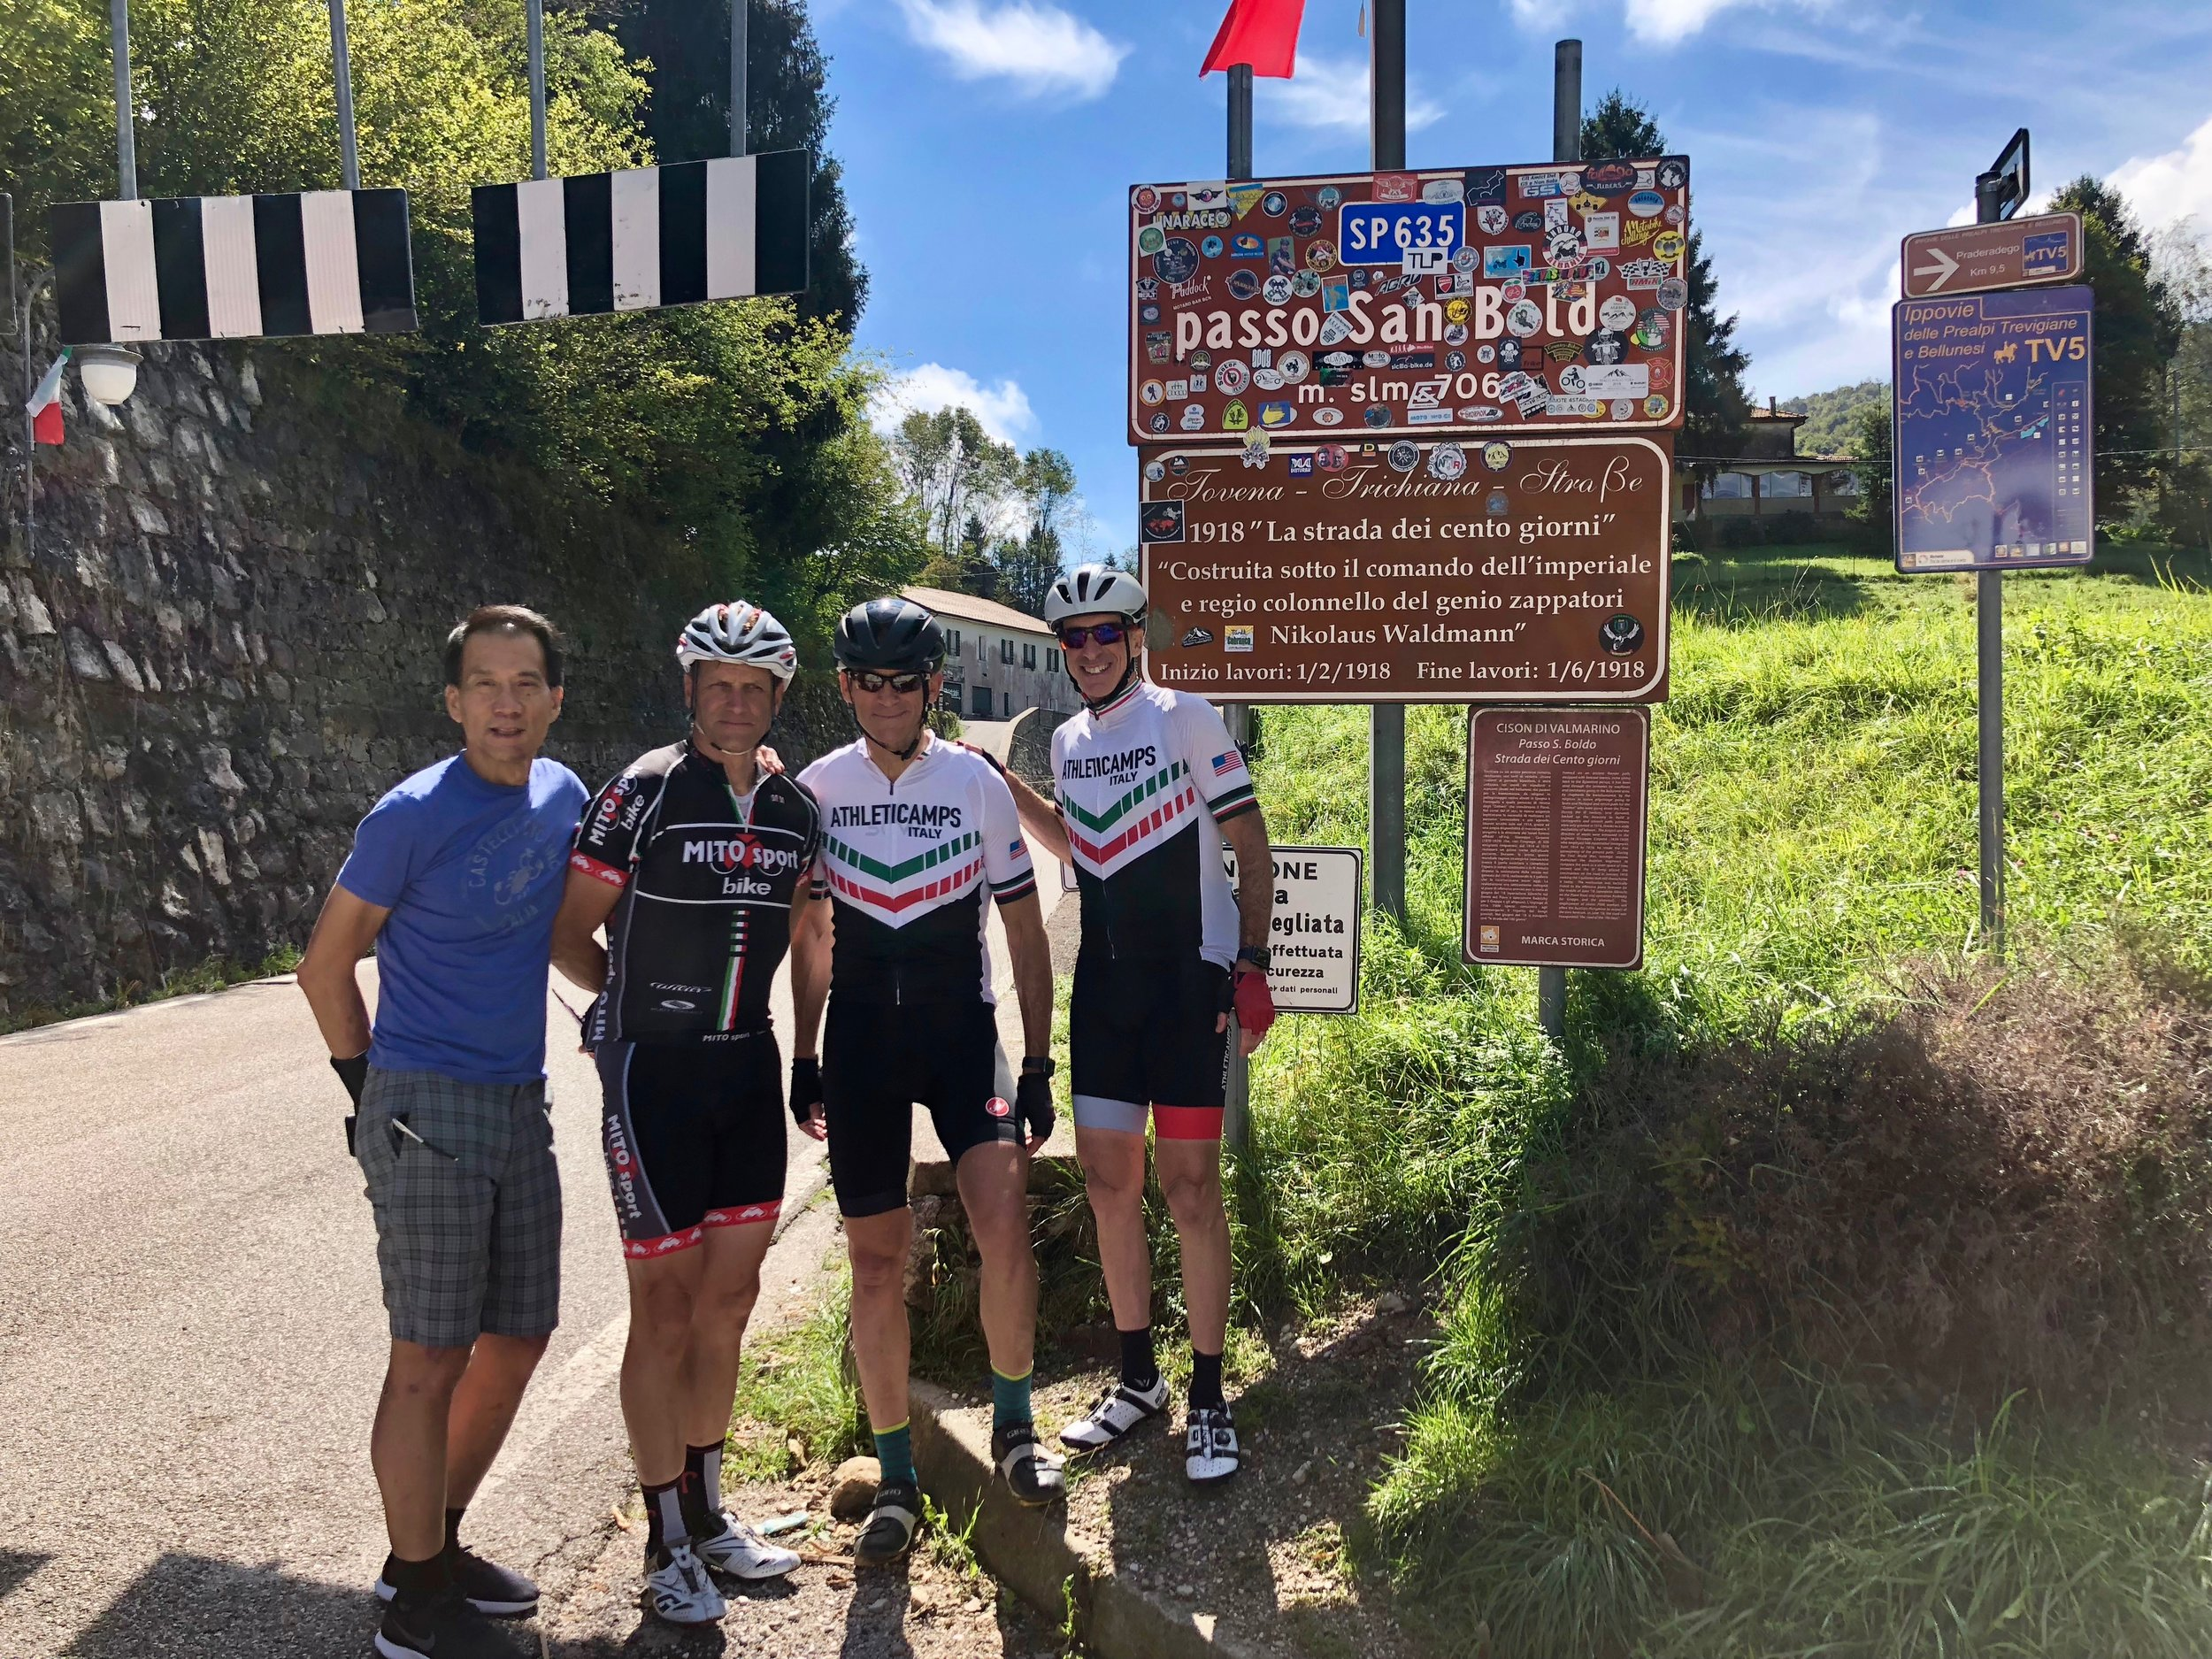 The top of Passo San Boldo